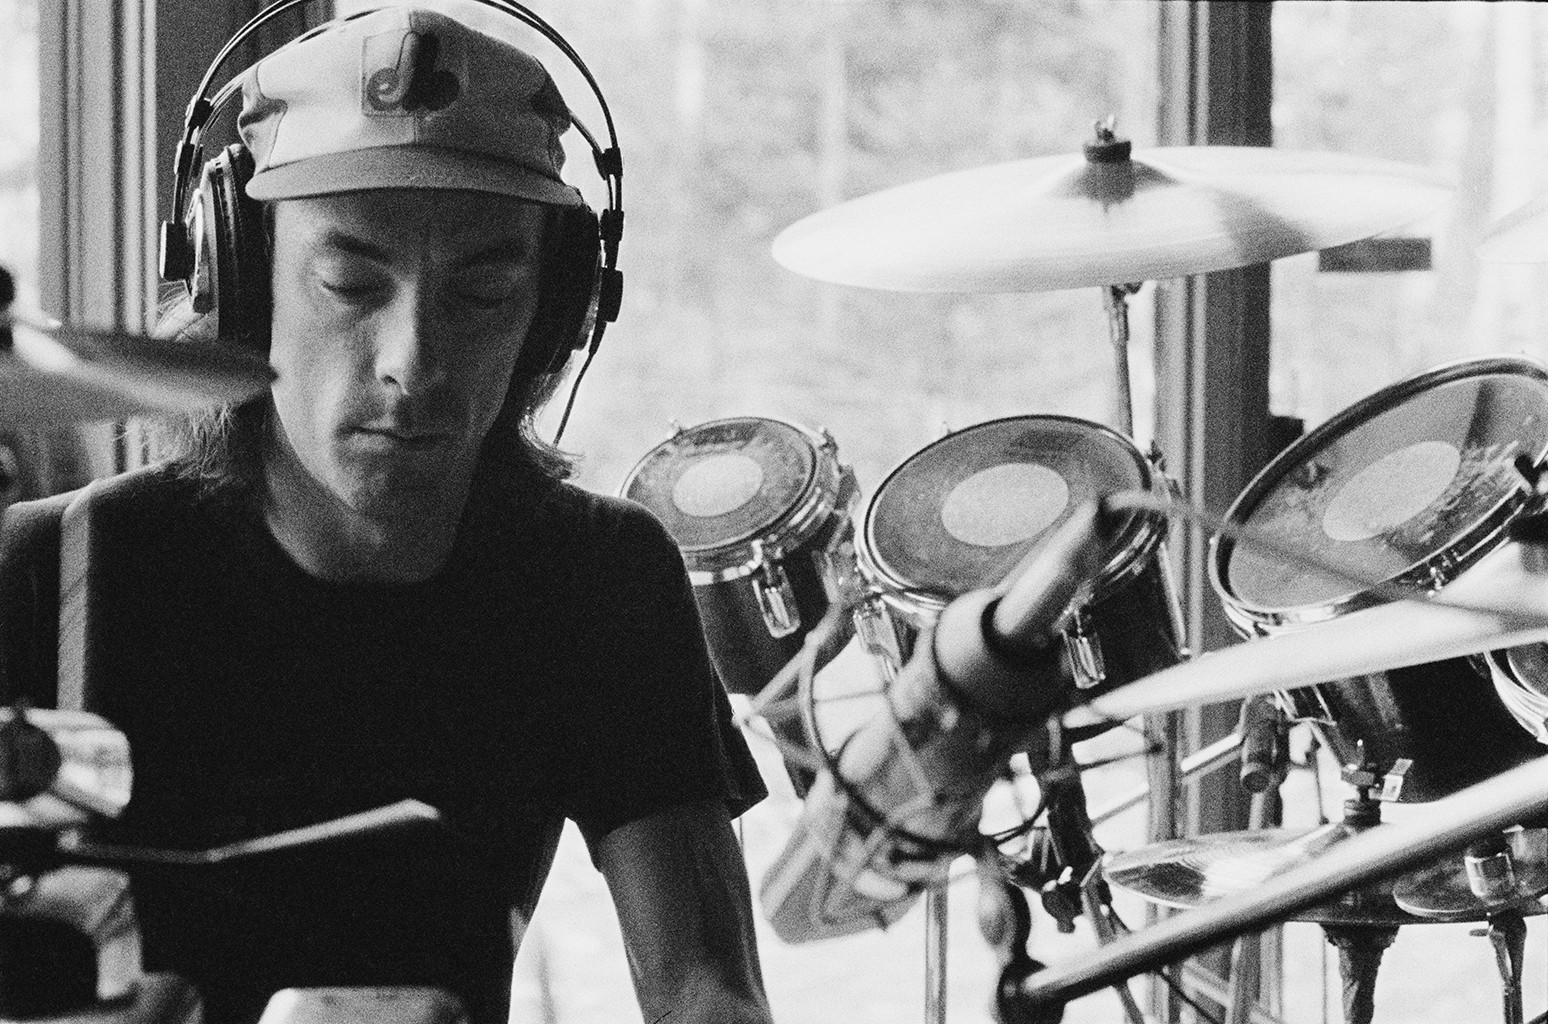 Drummer Neil Peart from Rush